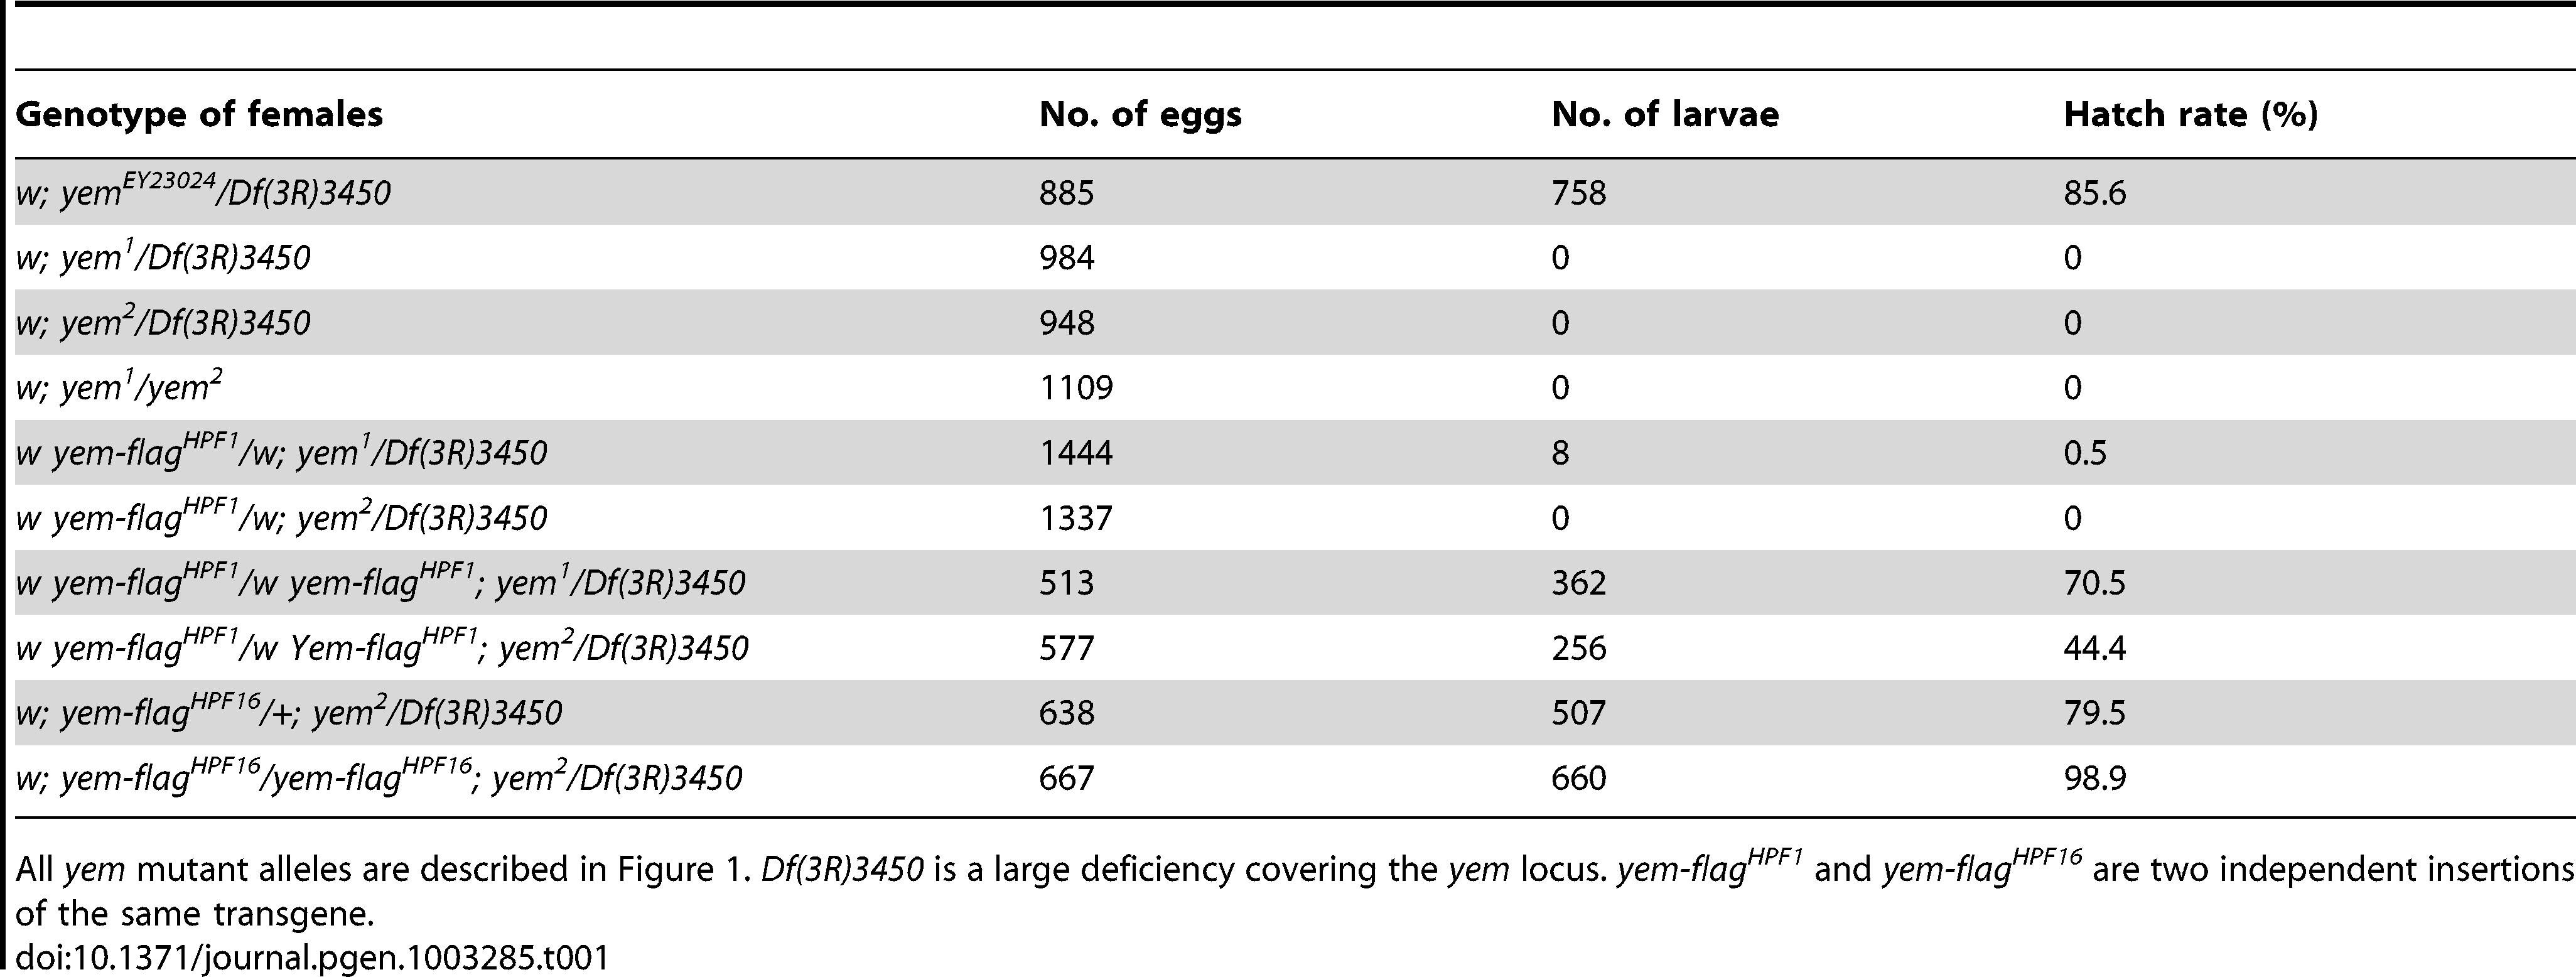 Female sterility associated with <i>yem</i> mutations.